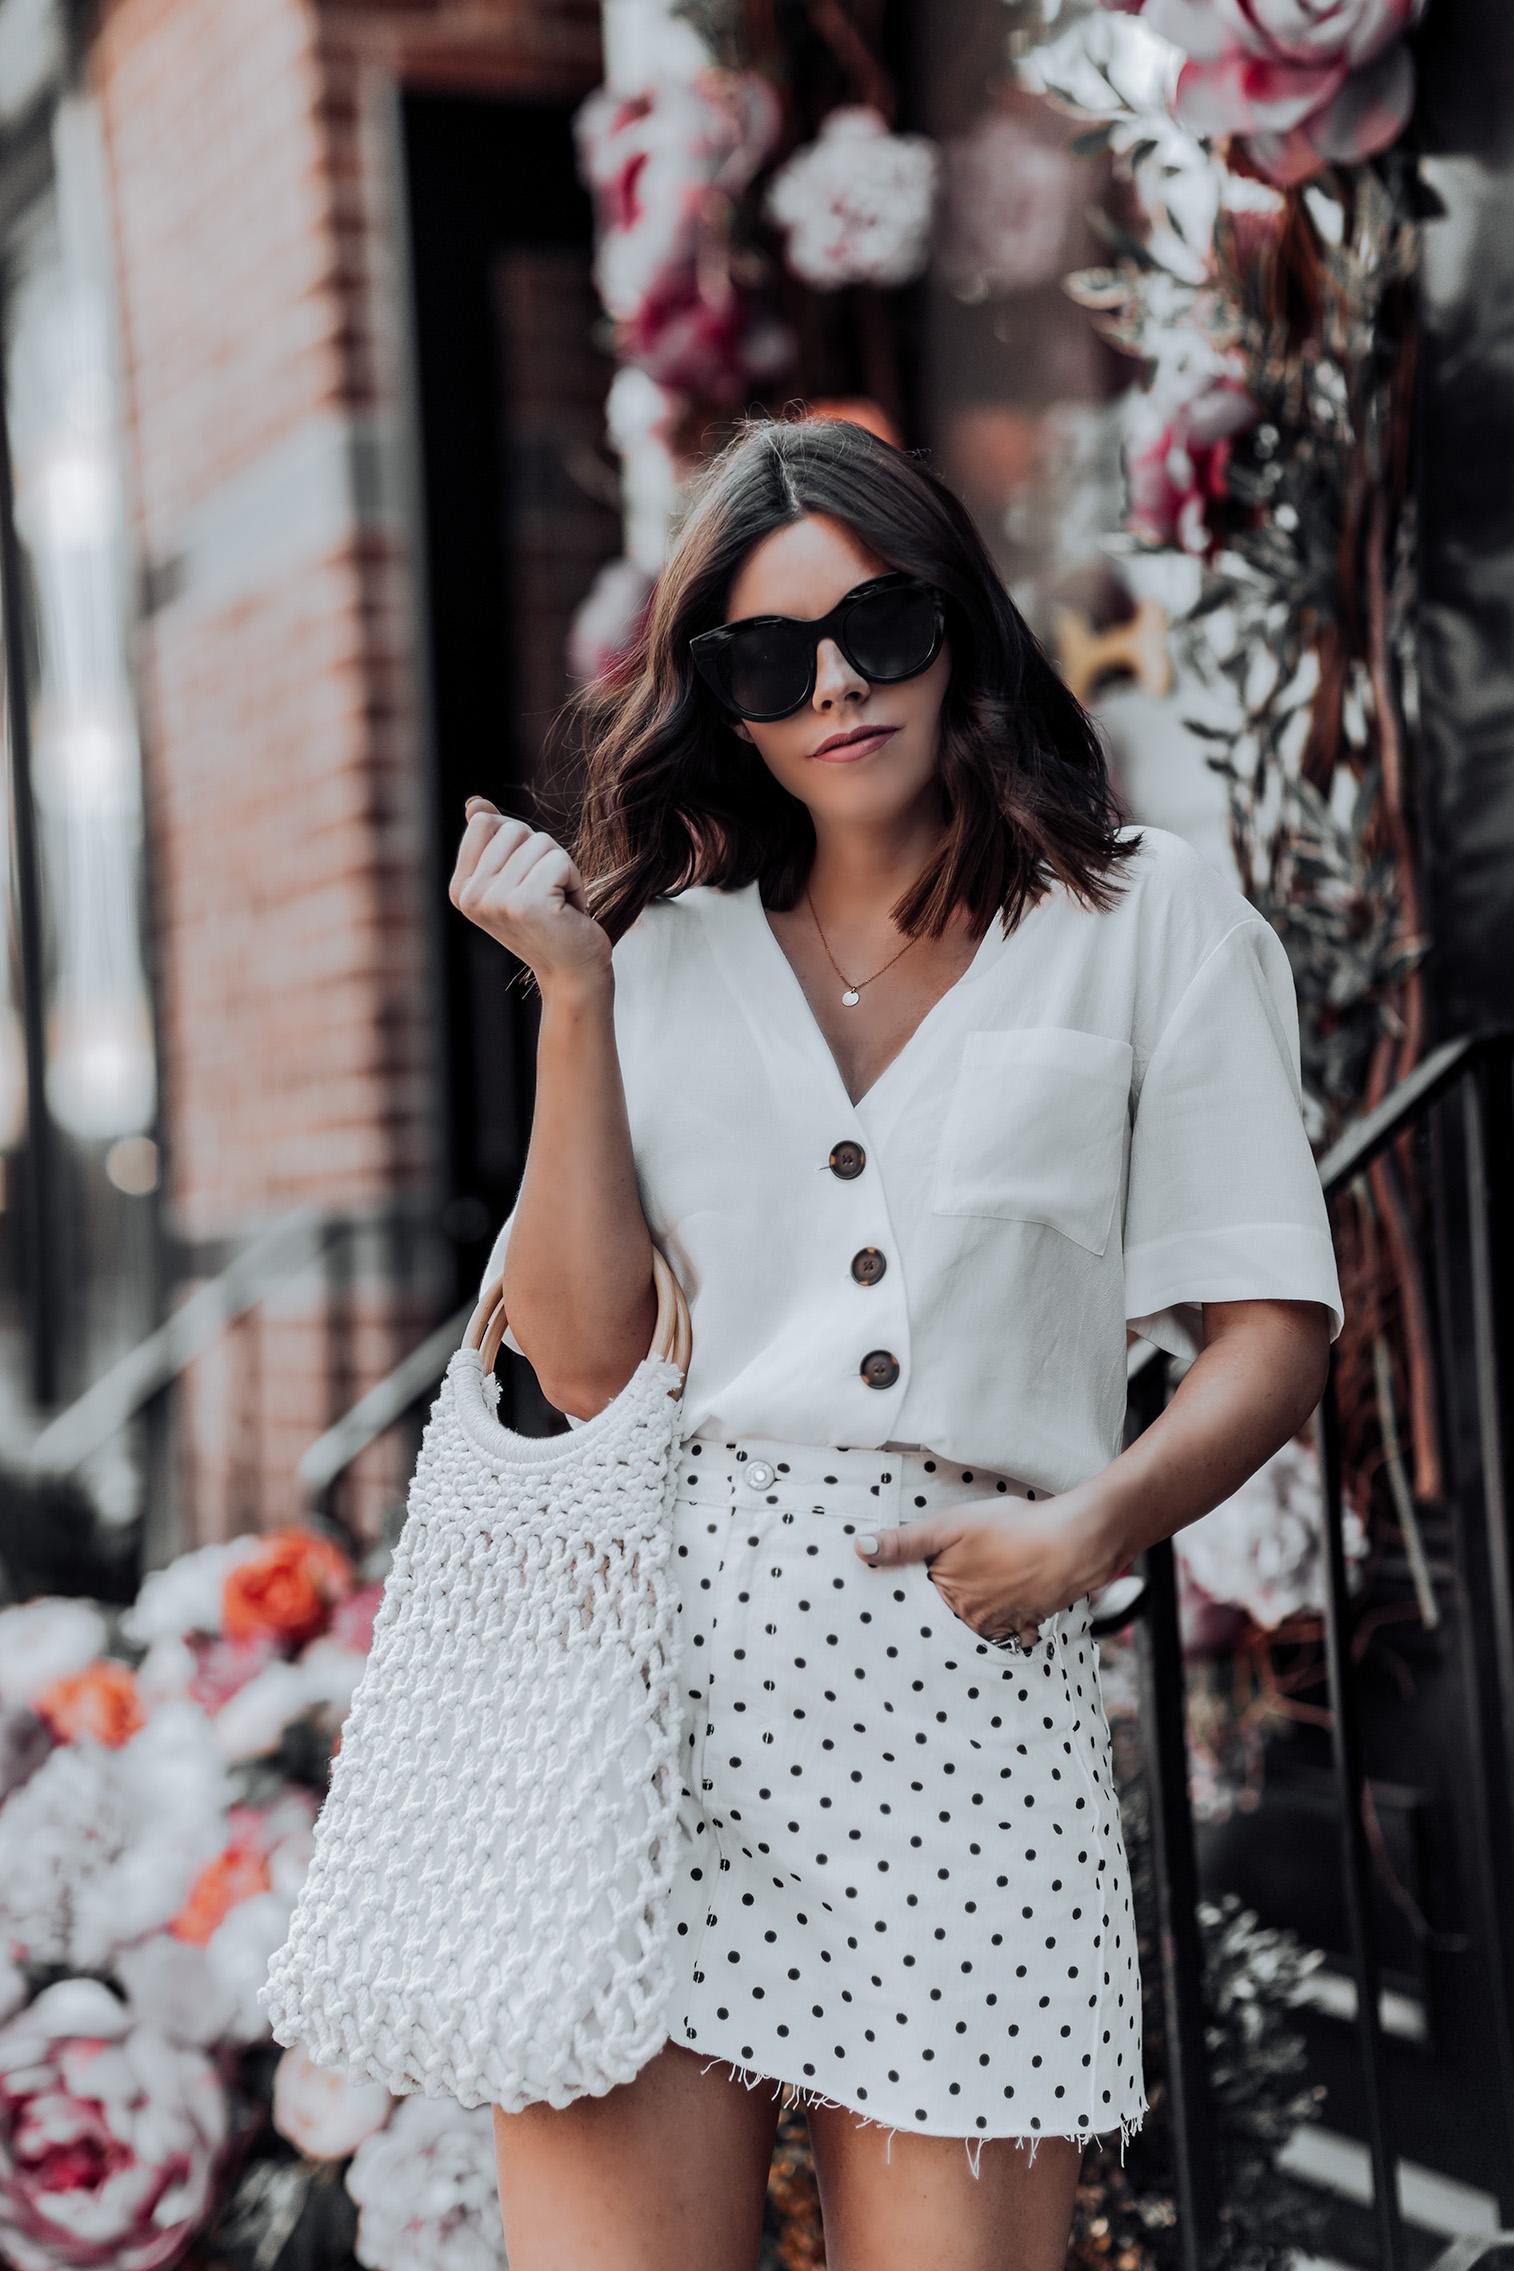 All white  Topshop Polka Dot Skirt   Topshop Blouse   String Shopper Bag   Woven Mules  Straw handbag Trend   Streetstyle blog #streetstyle #ootd #liketkit #topshop